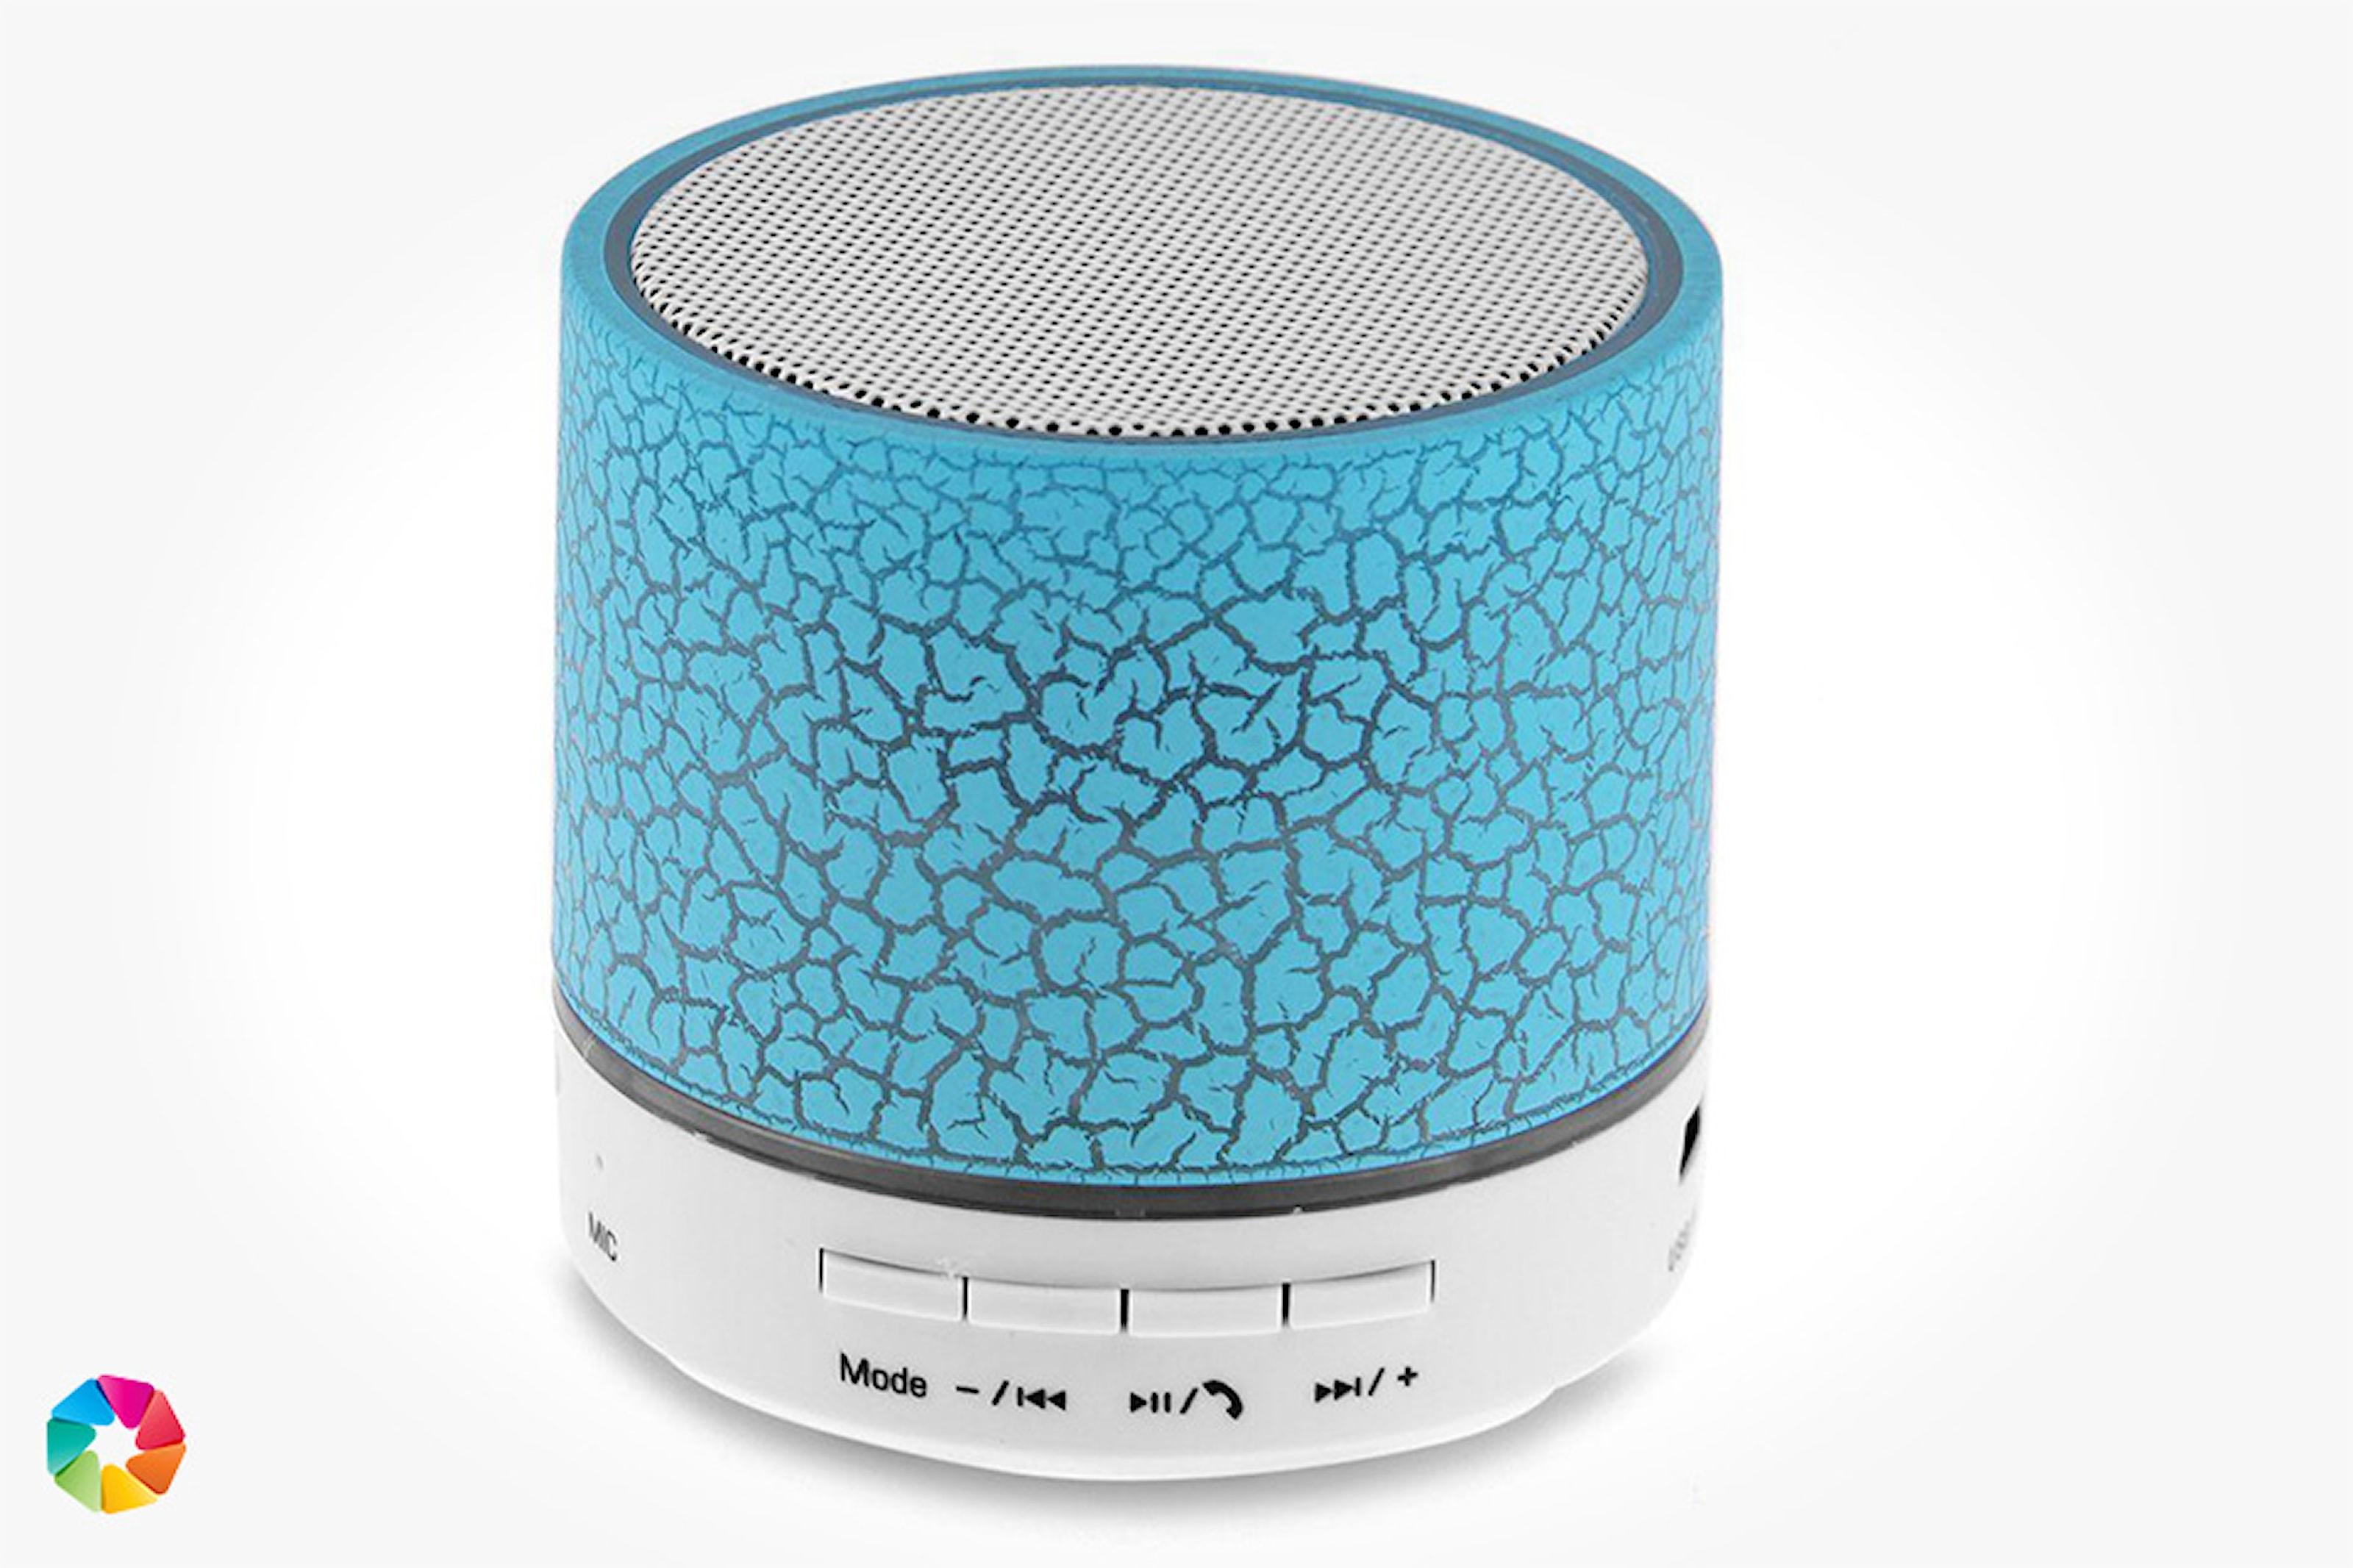 Trådløs Bluetooth-høyttaler med LED-lys